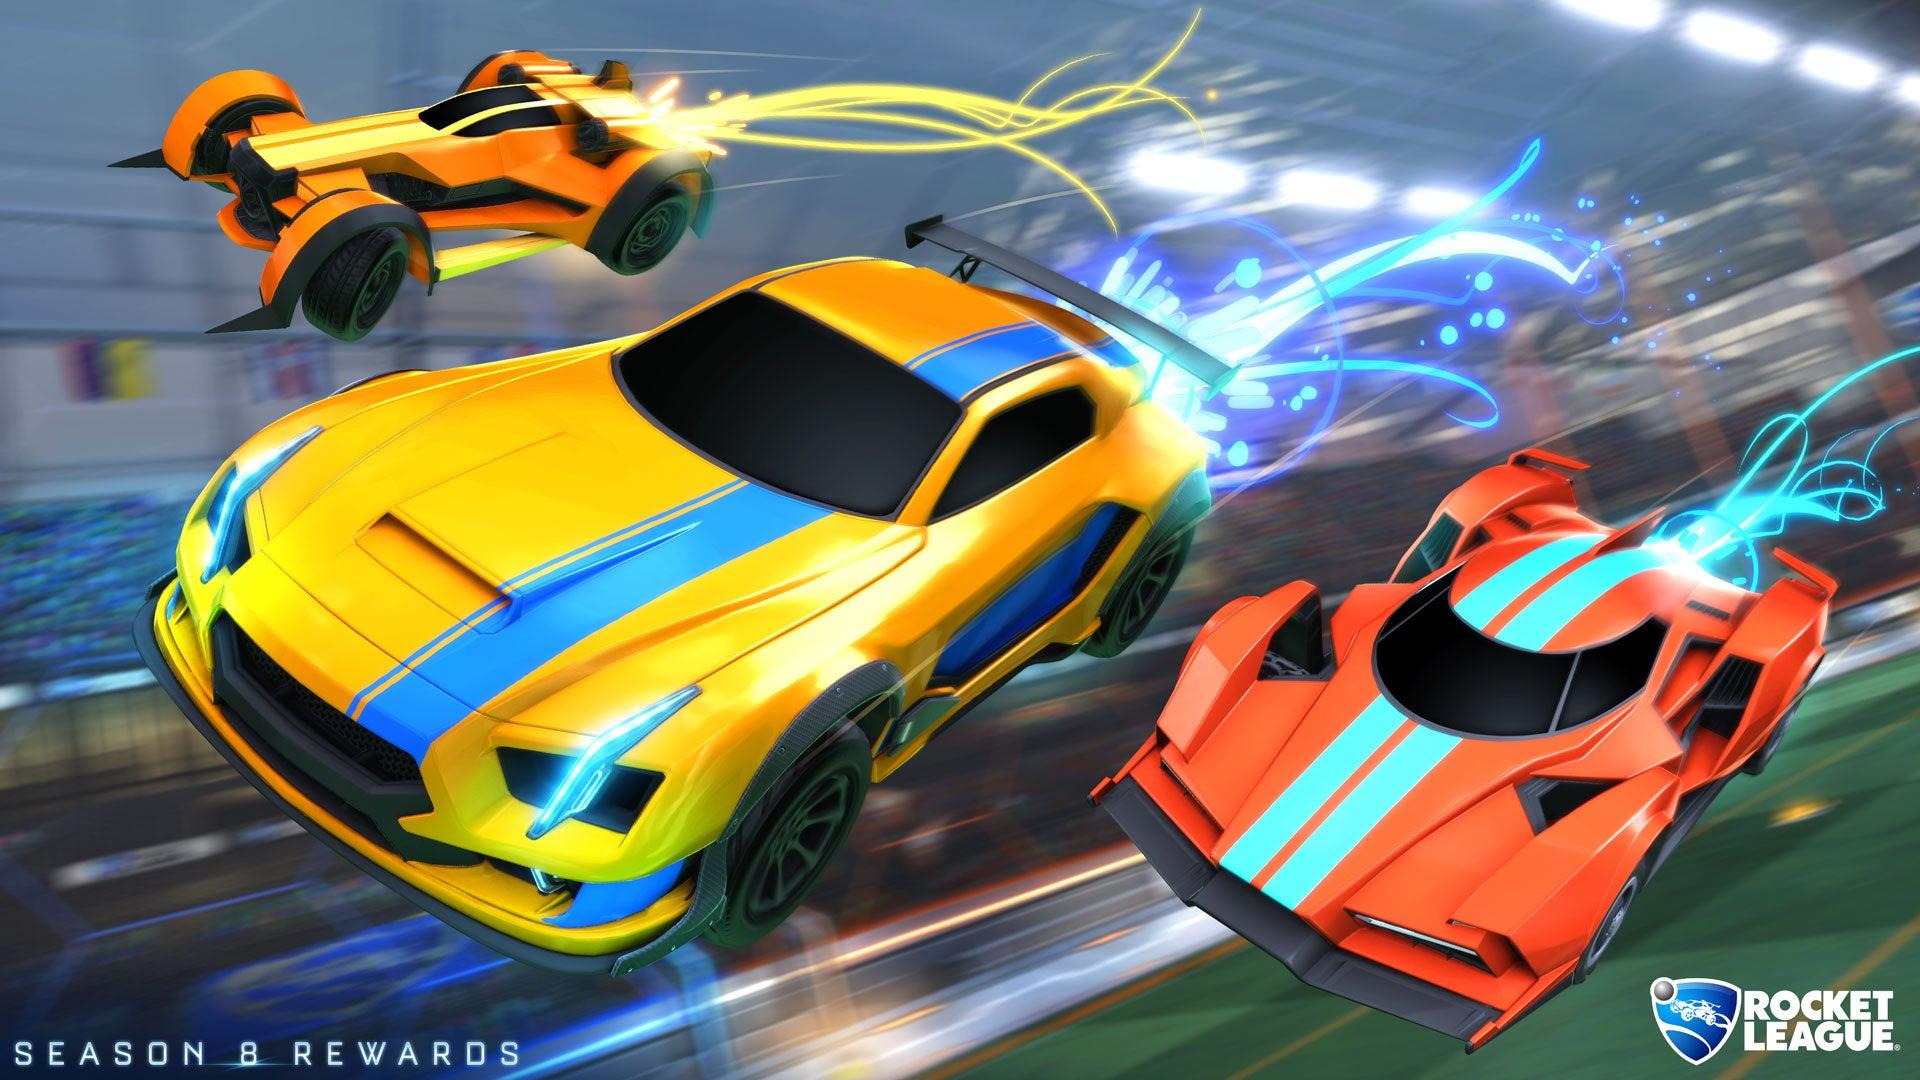 Competitive Season 8 Rewards and Season 9 Details | Rocket